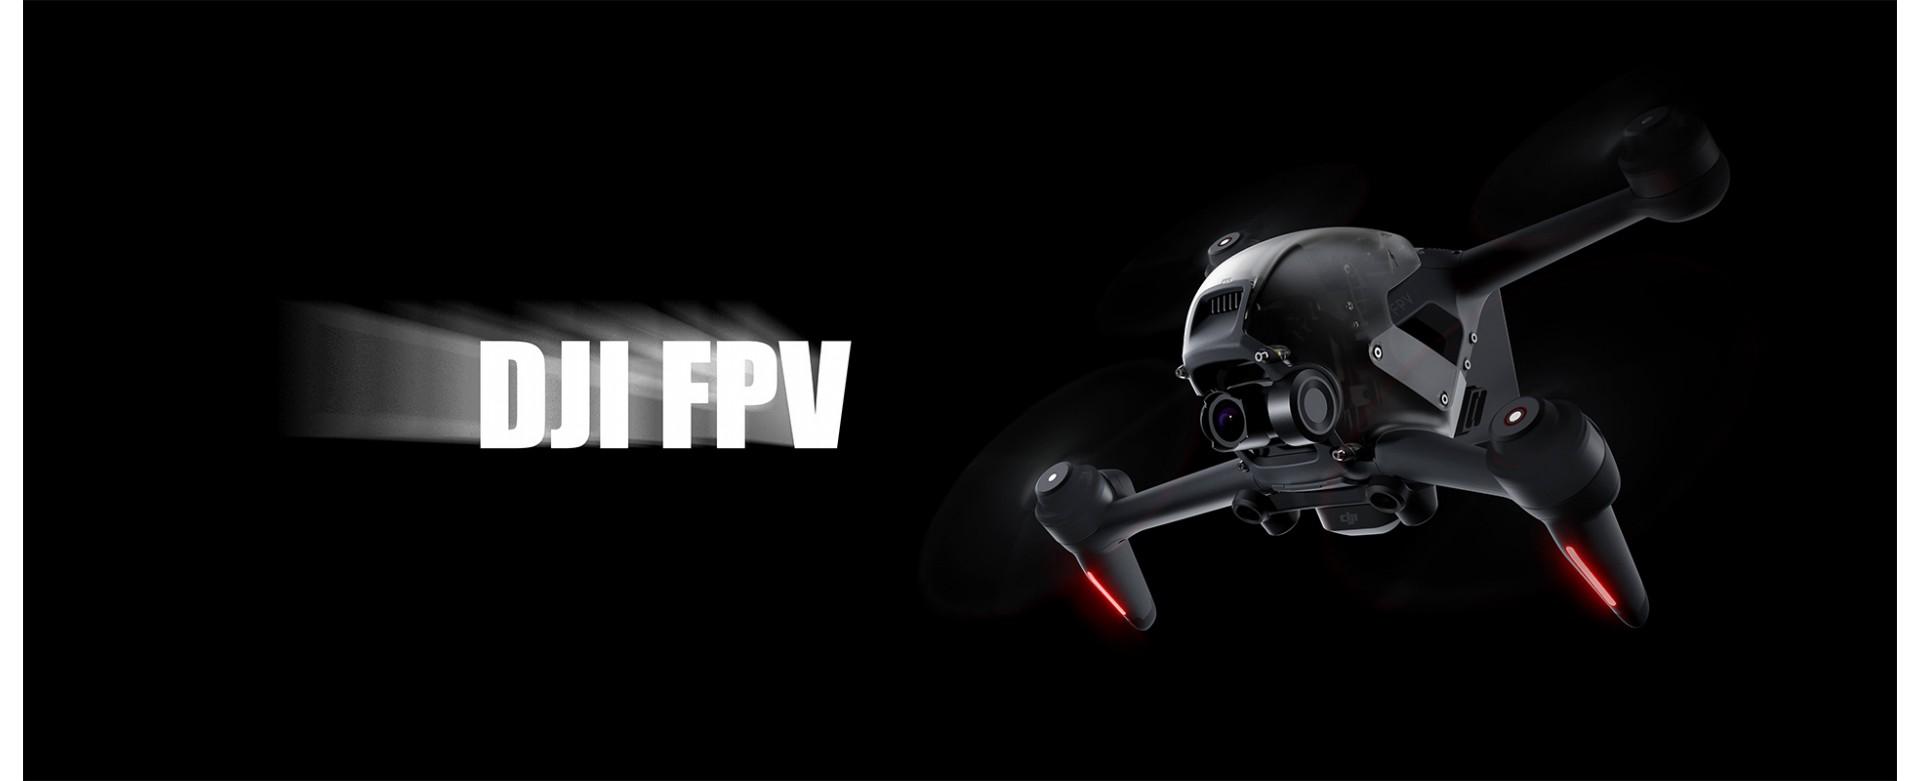 New Racing Drone DJI FPV| AeroCam.bg